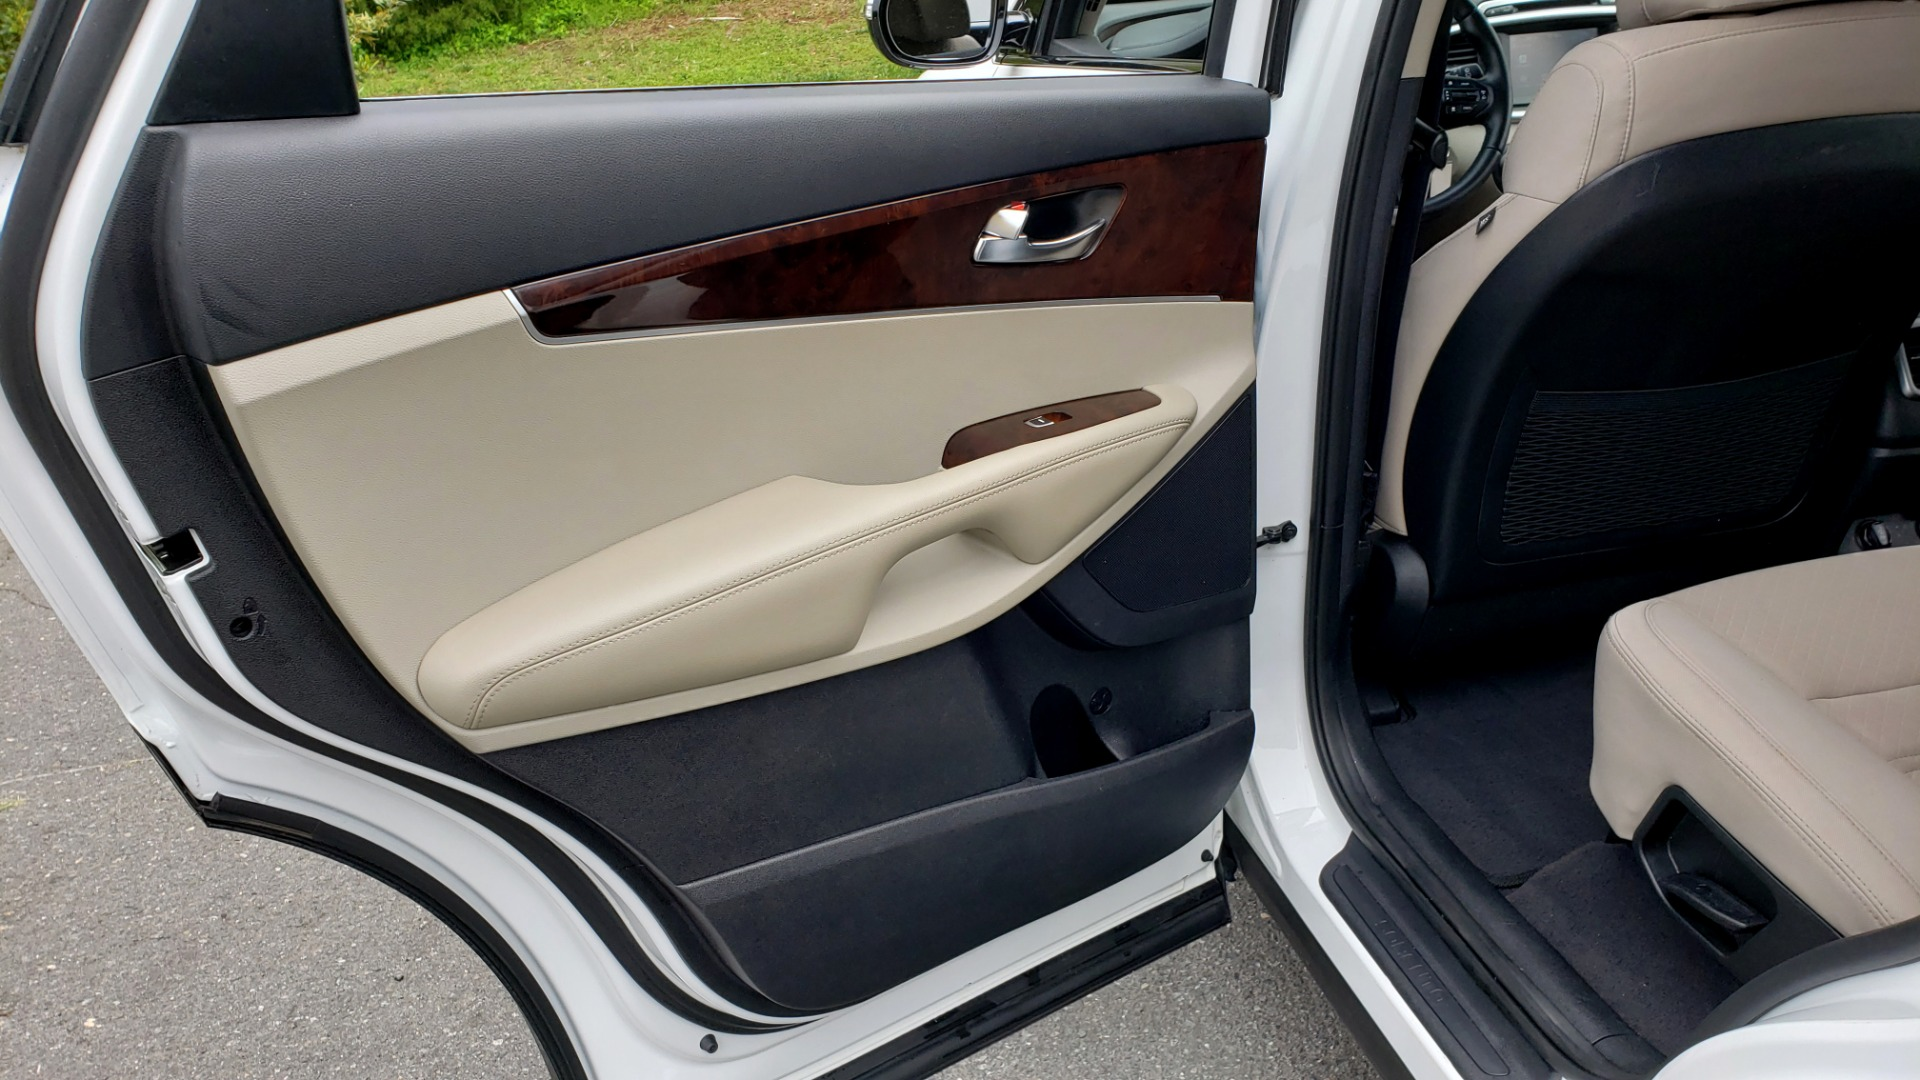 Used 2017 Kia SORENTO LX CONV PKG / FWD / ADVANCED TECH / 3-ROW for sale Sold at Formula Imports in Charlotte NC 28227 58